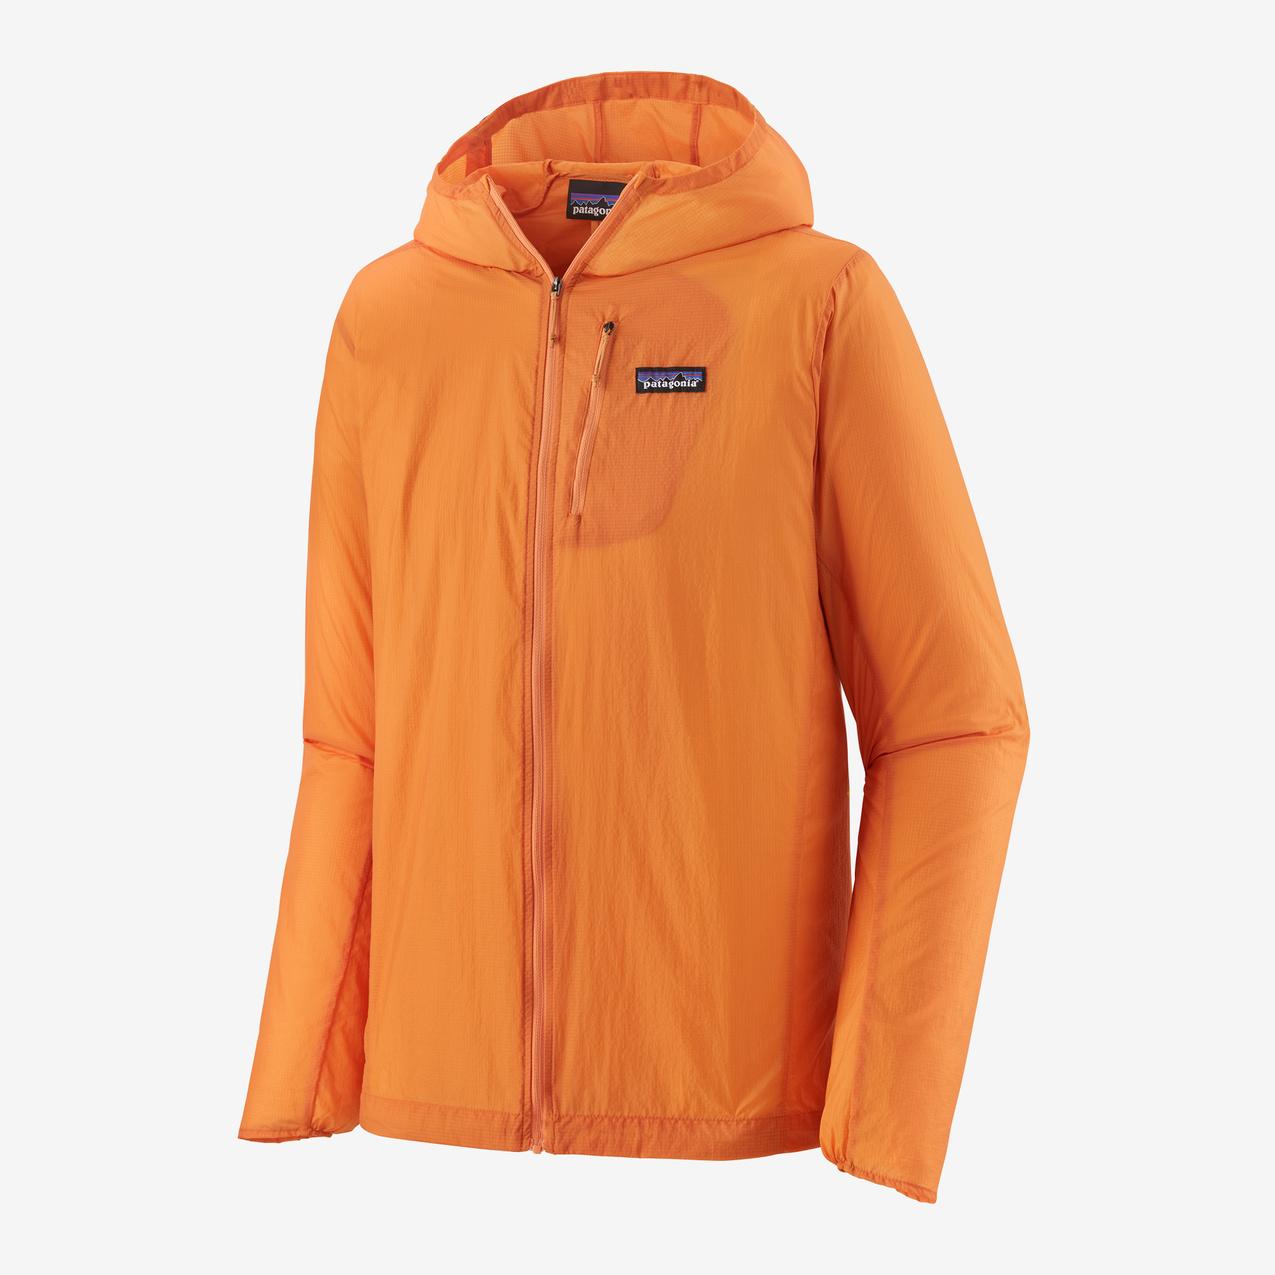 Patagonia メンズ フーディニ ジャケット #24142  パタゴニア